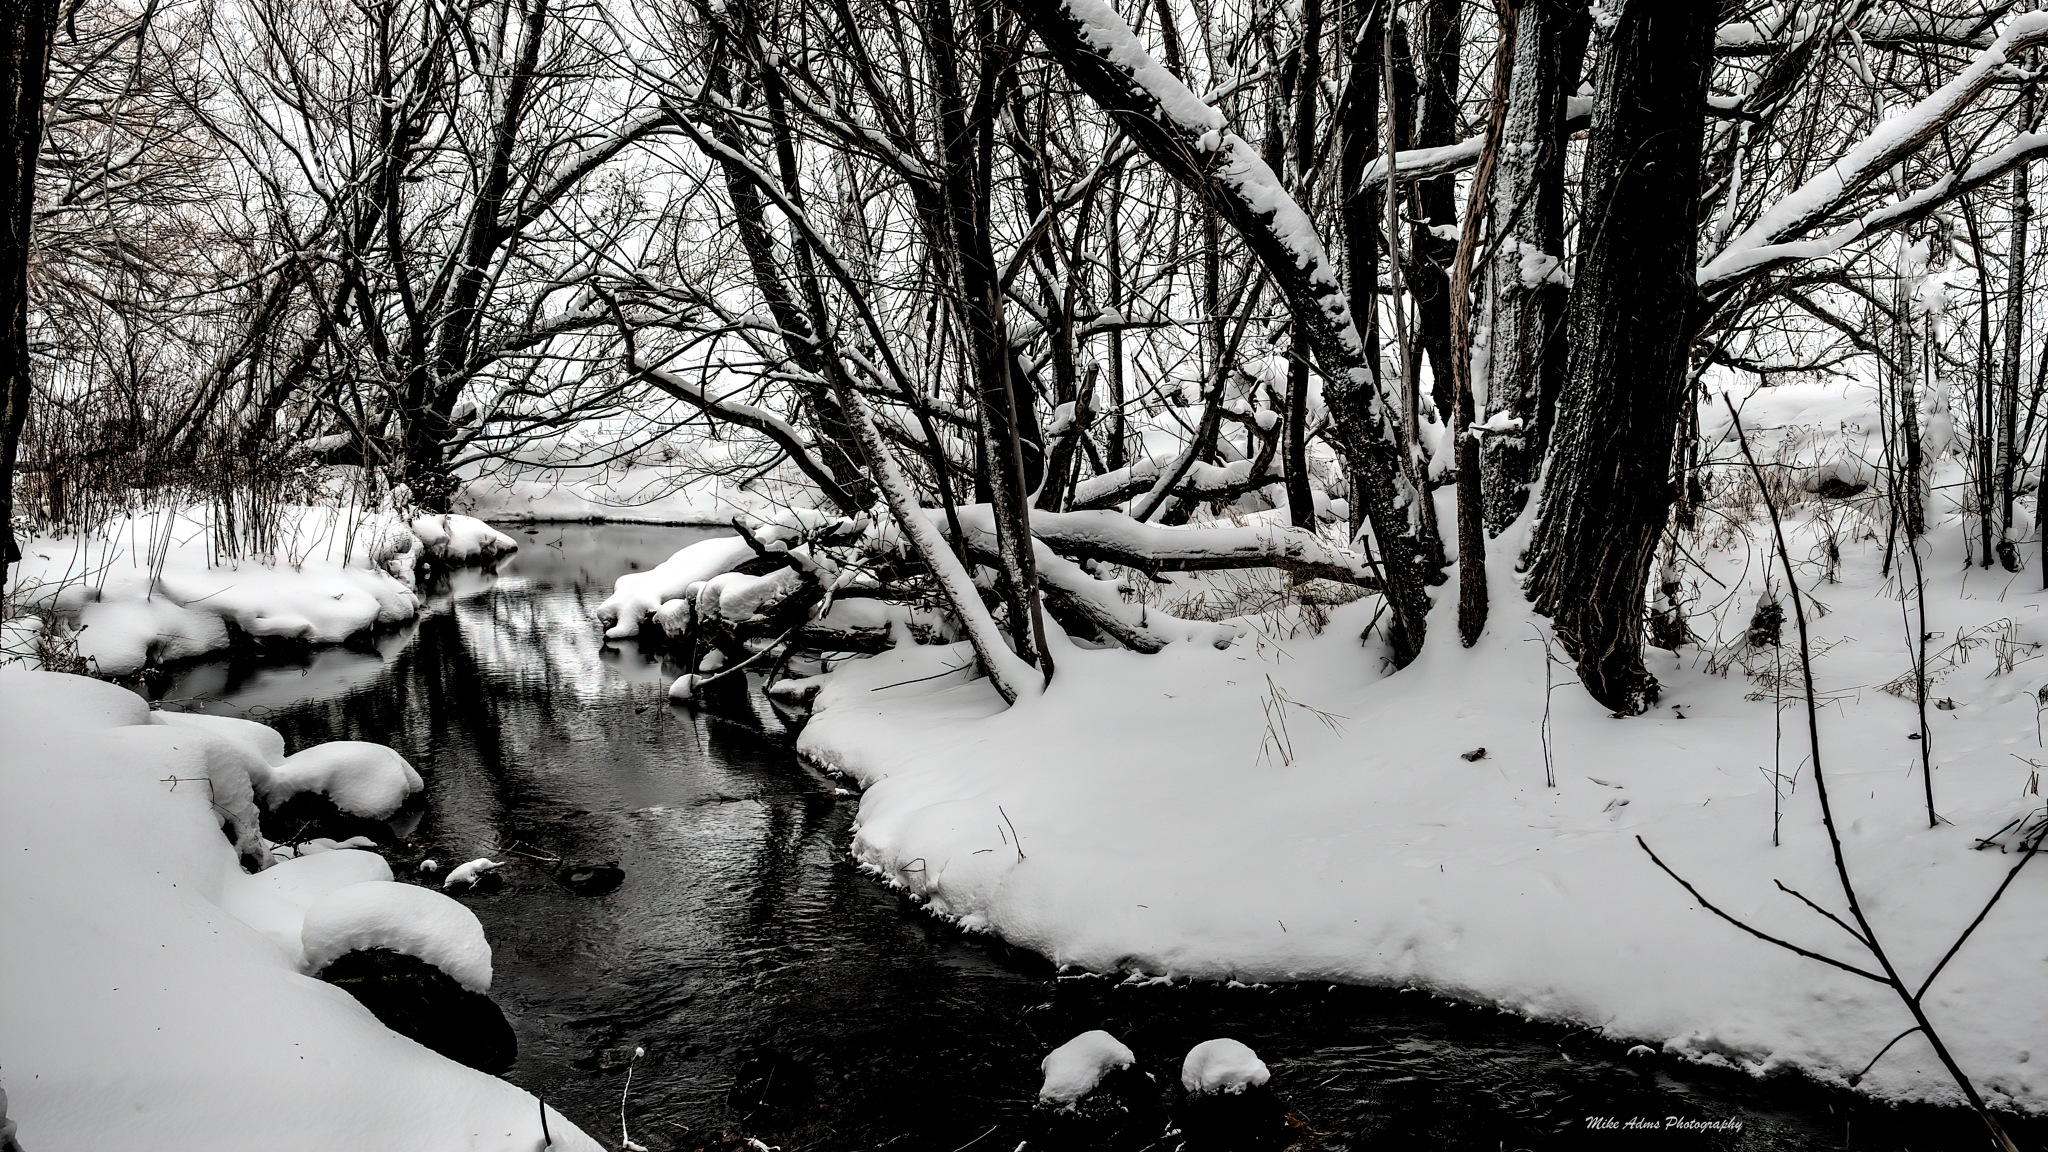 Winter by Mike Adams